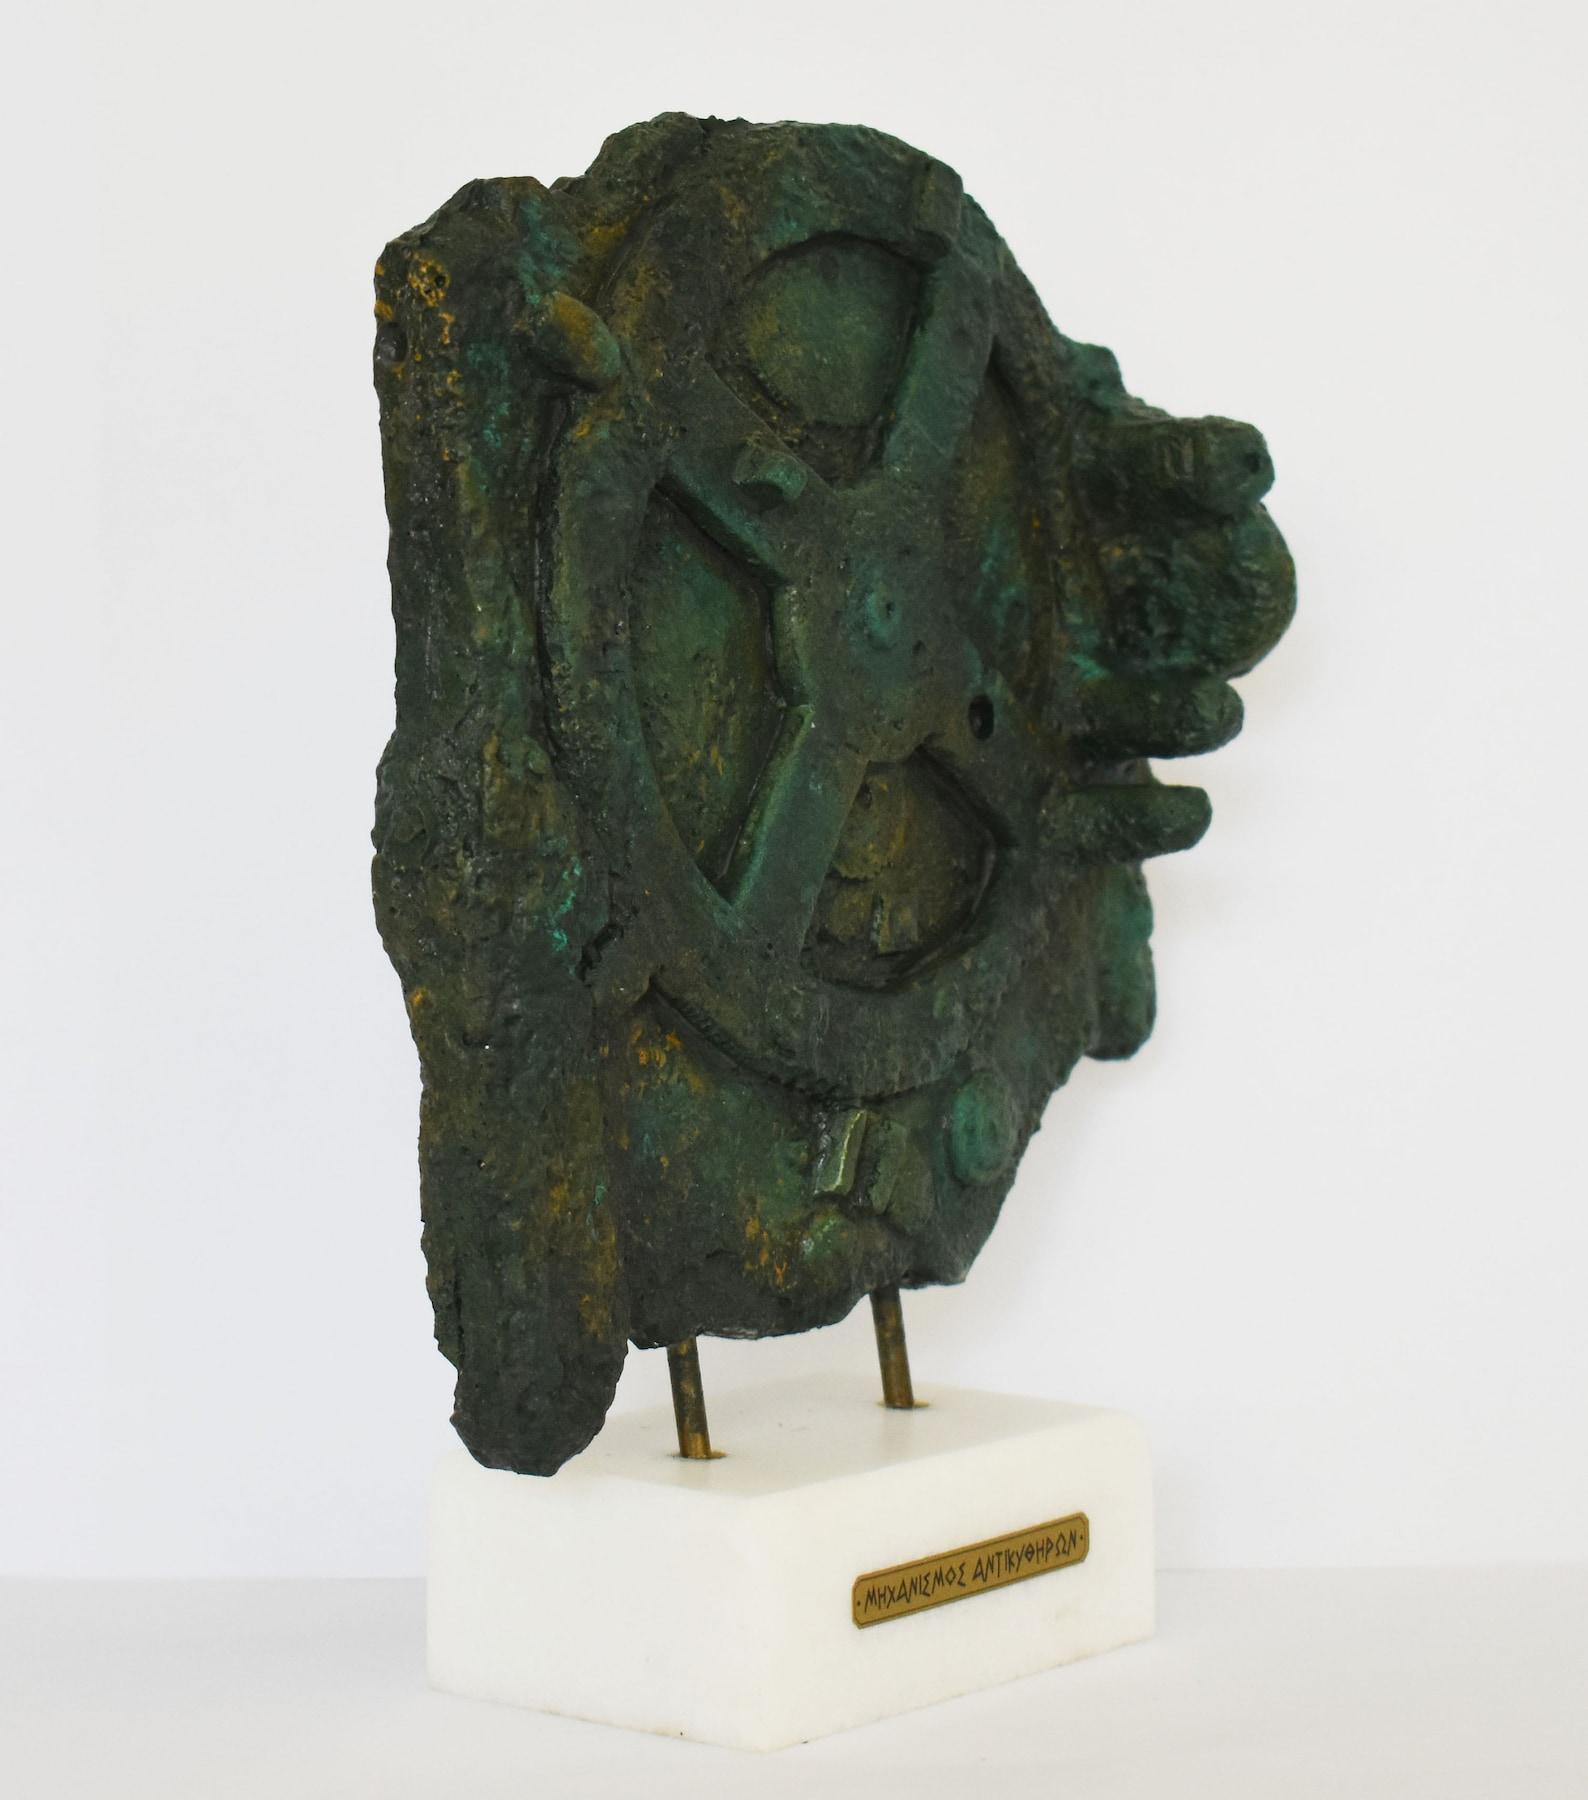 Antikythera Mechanism The Ancient Greek Analogue Computer